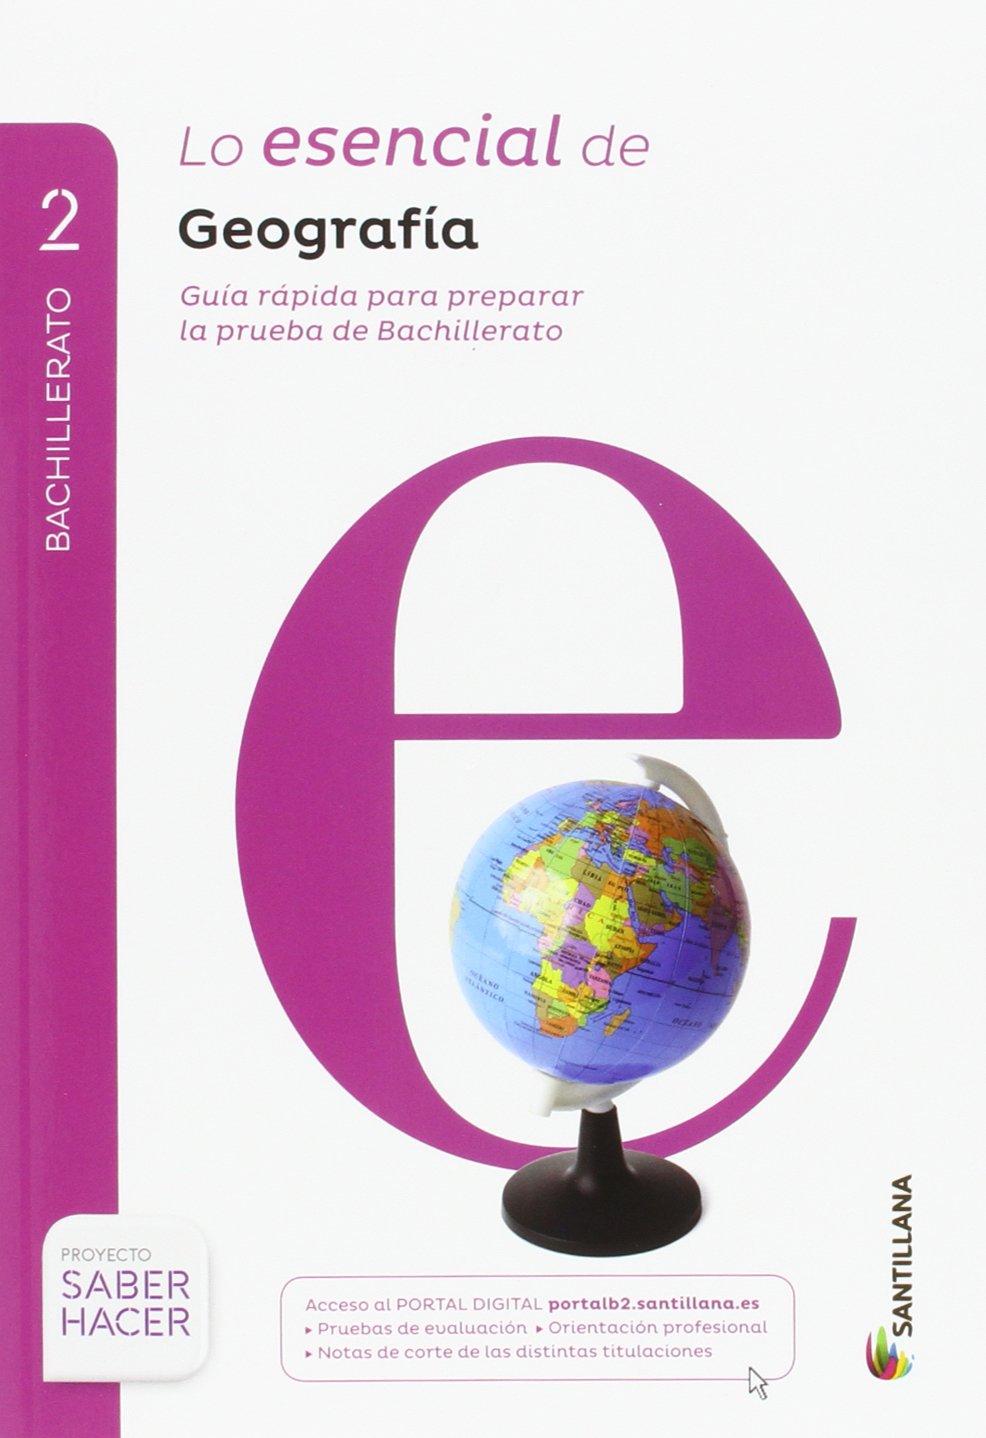 Geografía Serie Descubre. 2 Bachillerato. Saber Hacer + Cuaderno Evaluación - 9788414101889: Amazon.es: Vv.Aa.: Libros